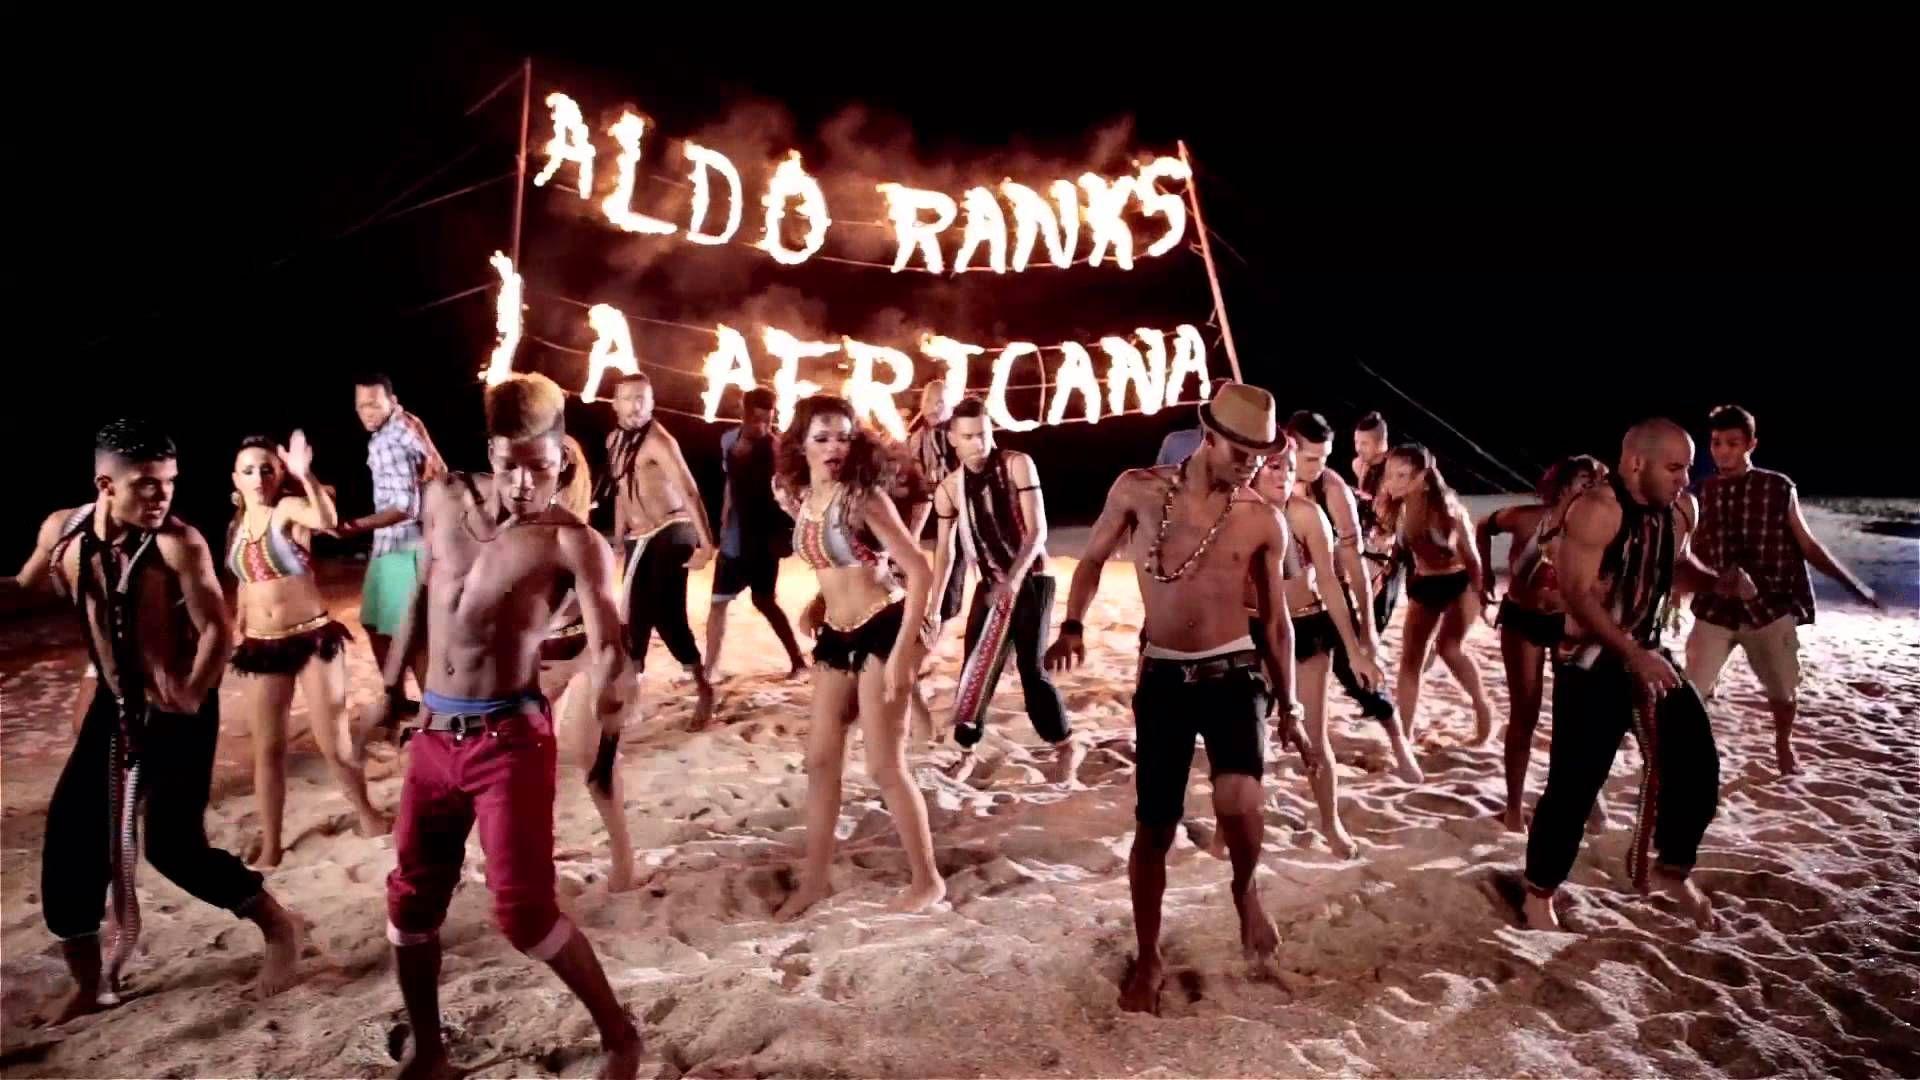 #LaAfricana By Aldo Ranks